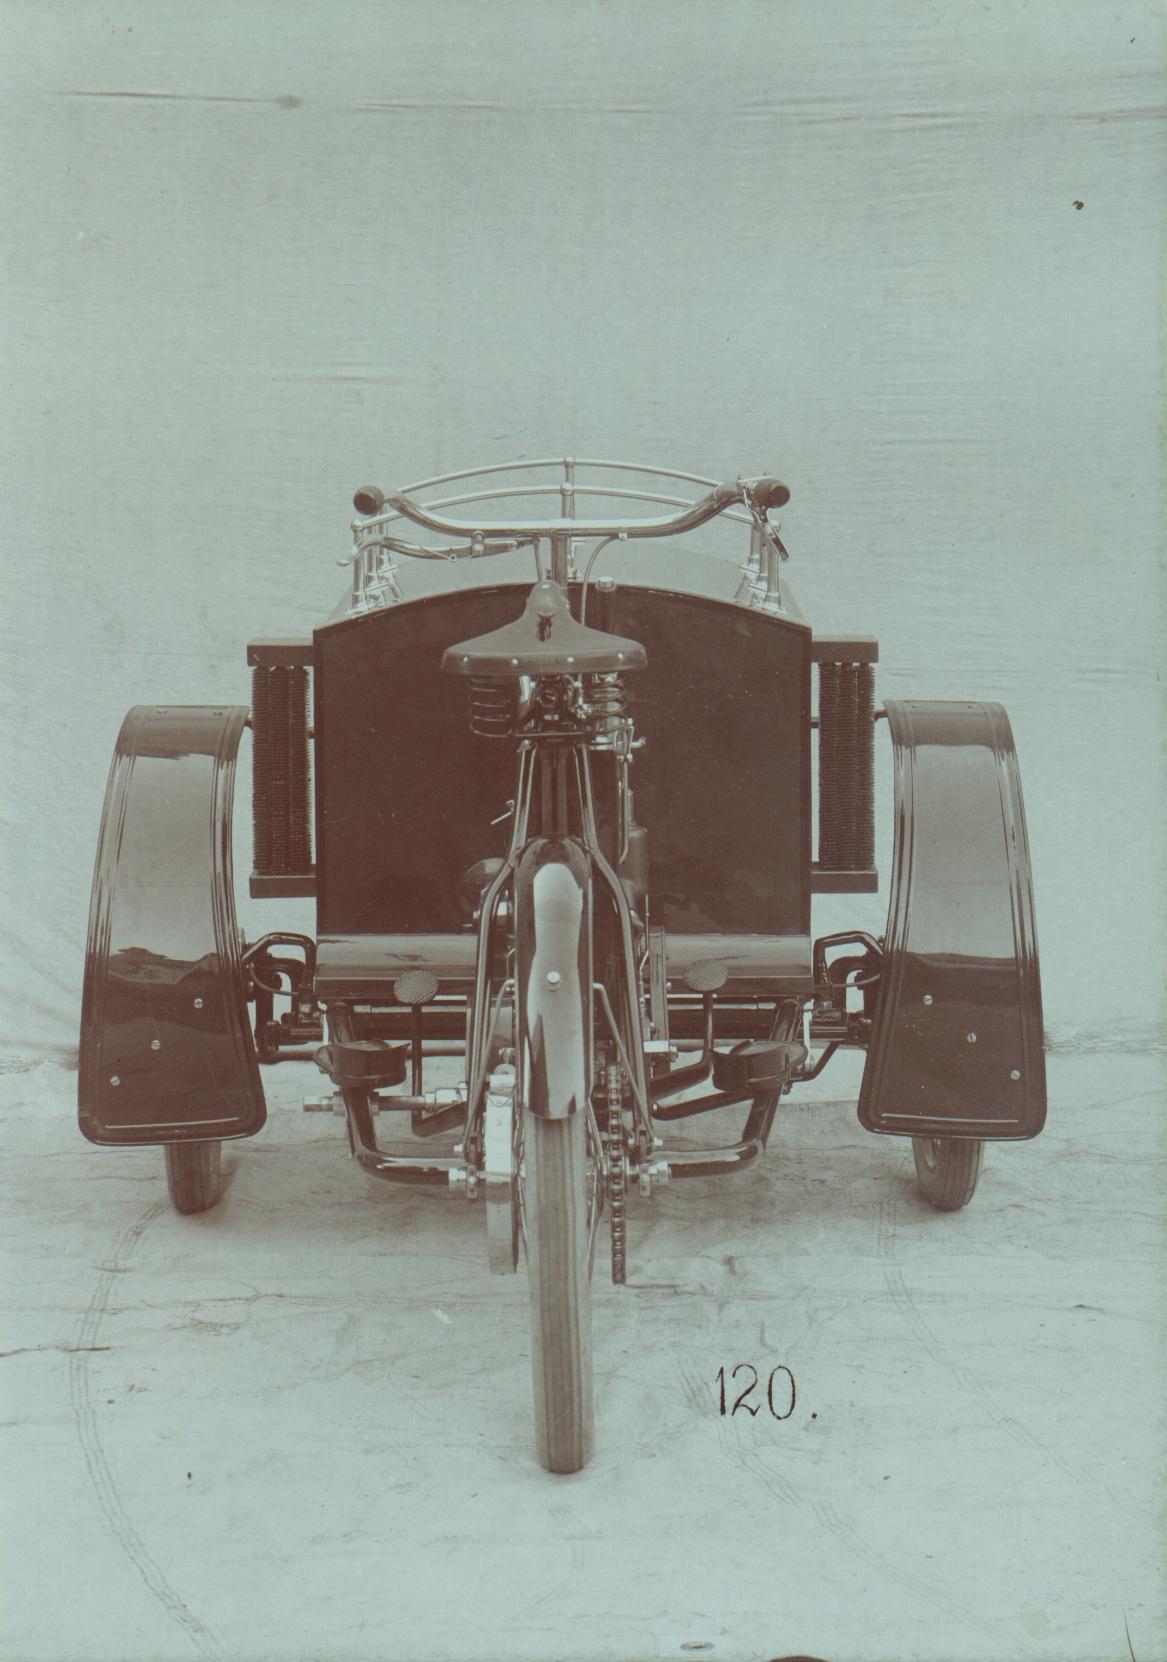 The-LW-three-wheeler-4_JPG